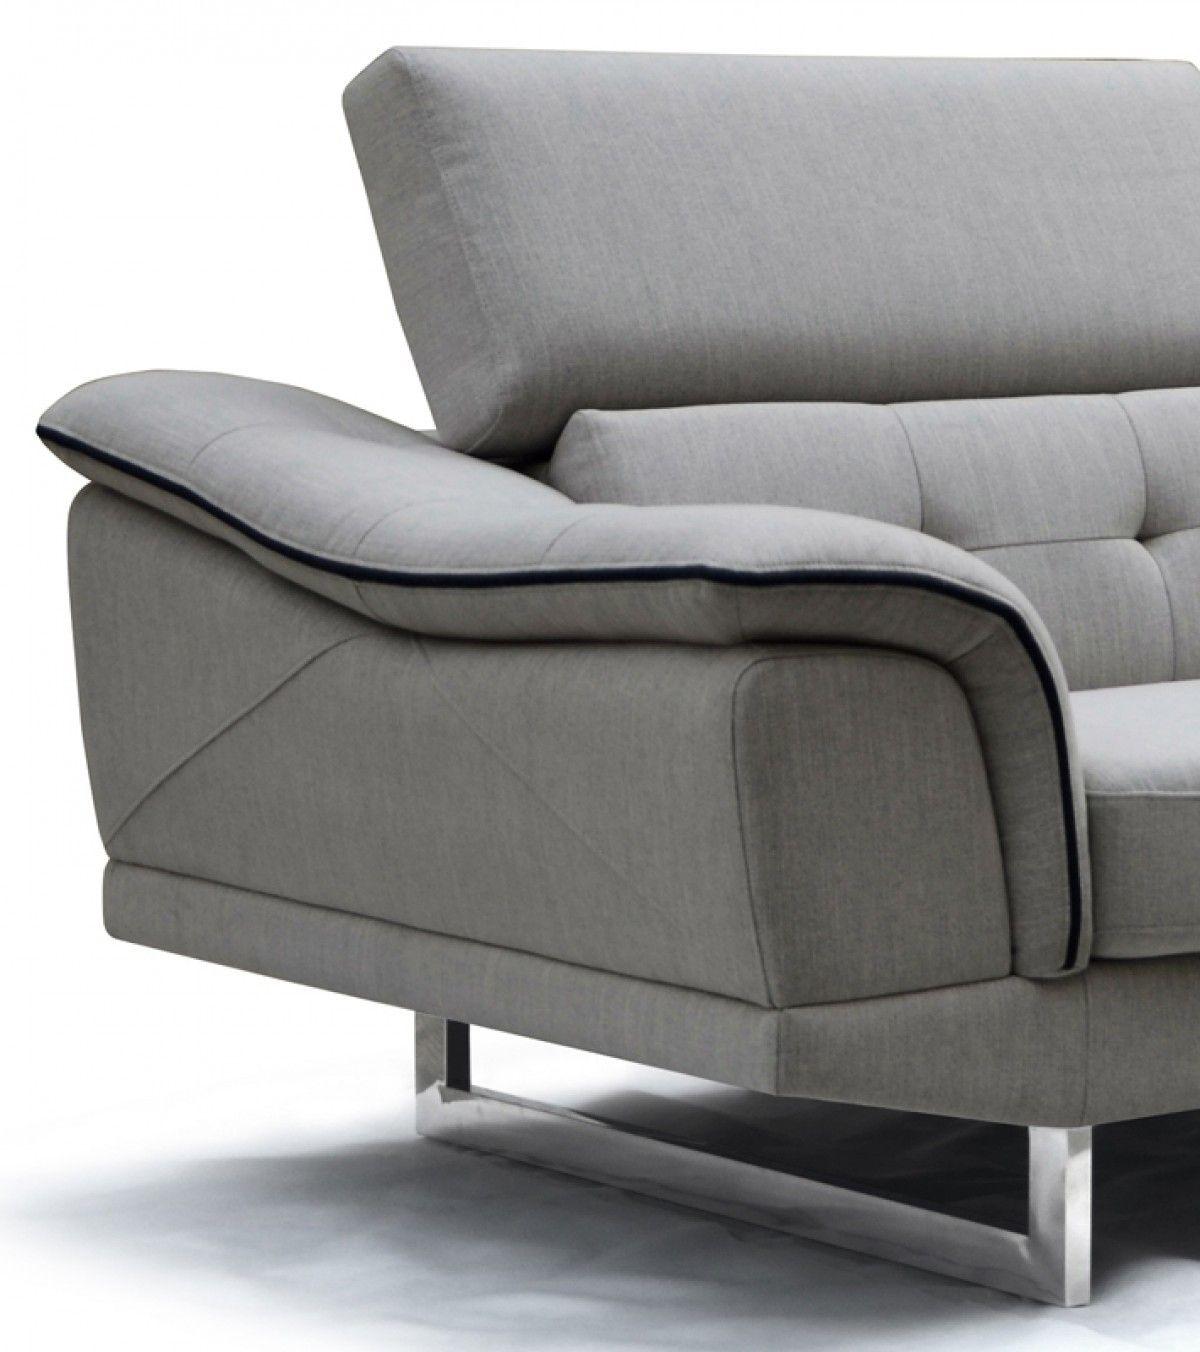 Divani Casa Gaviota Reversible Chaise Sectional Mobilya Kanepeler Ic Tasarim